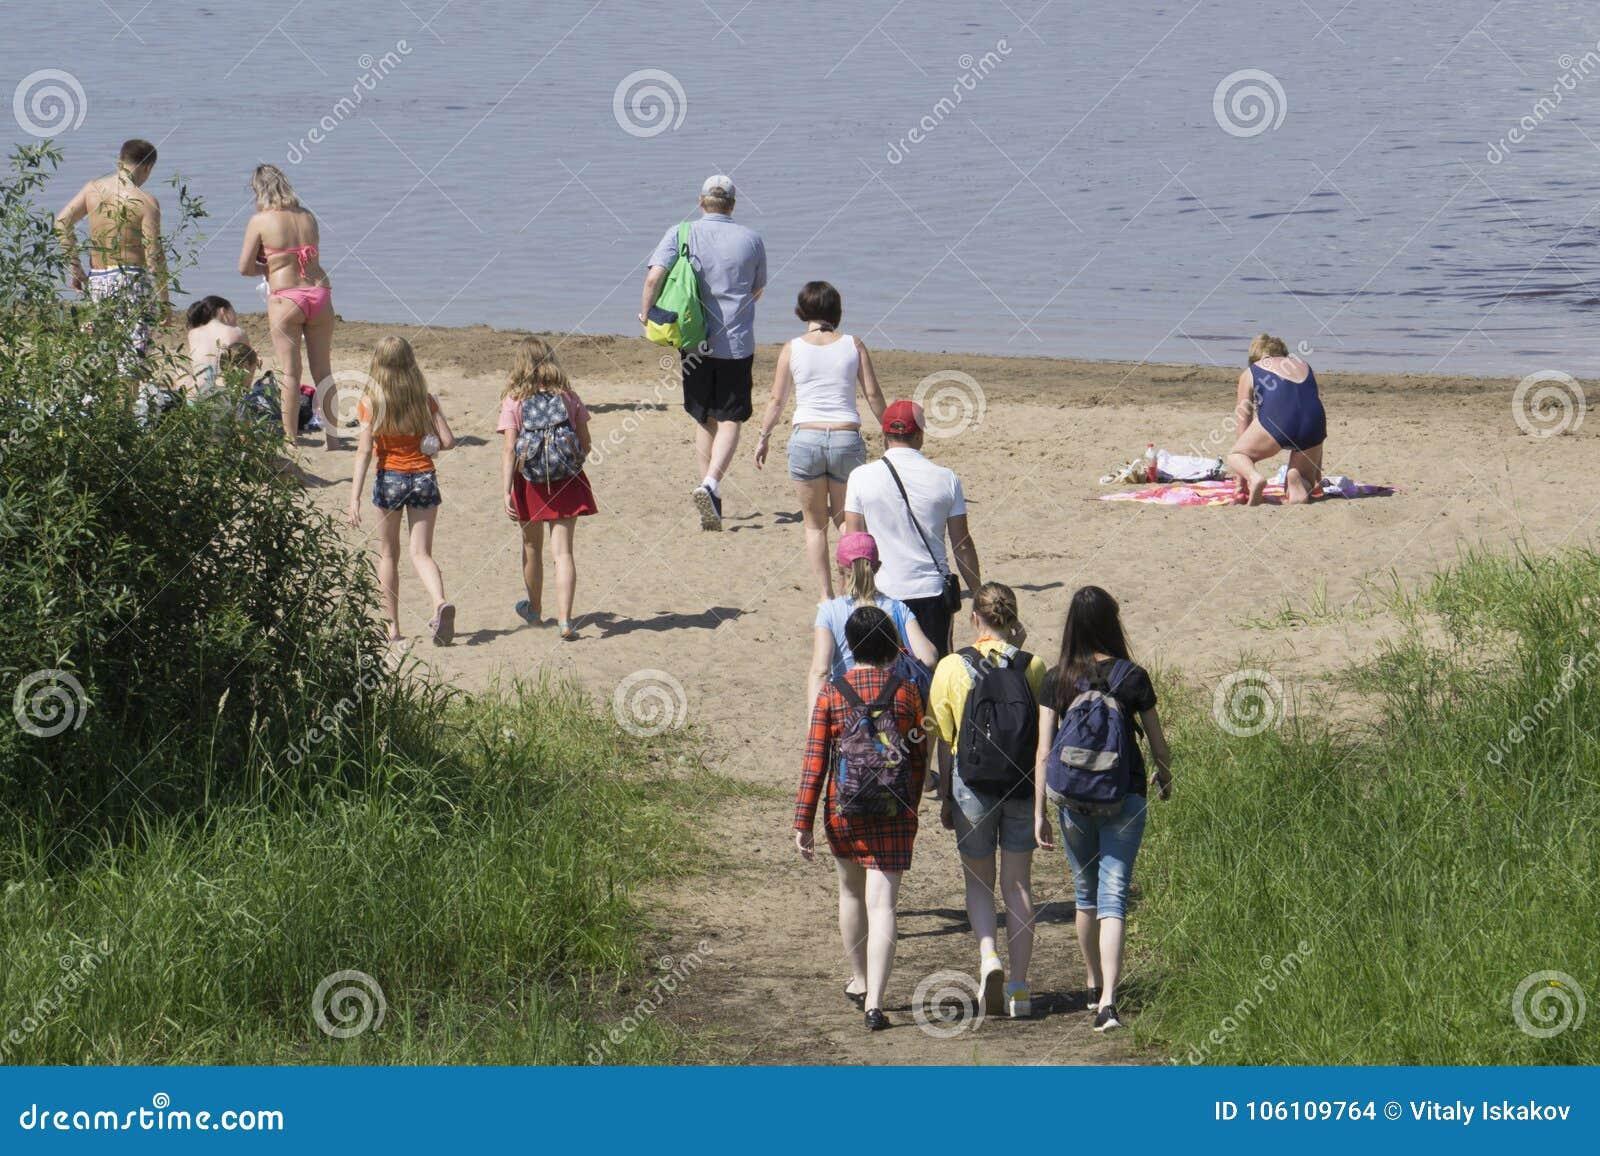 People go to the beach to sunbathe